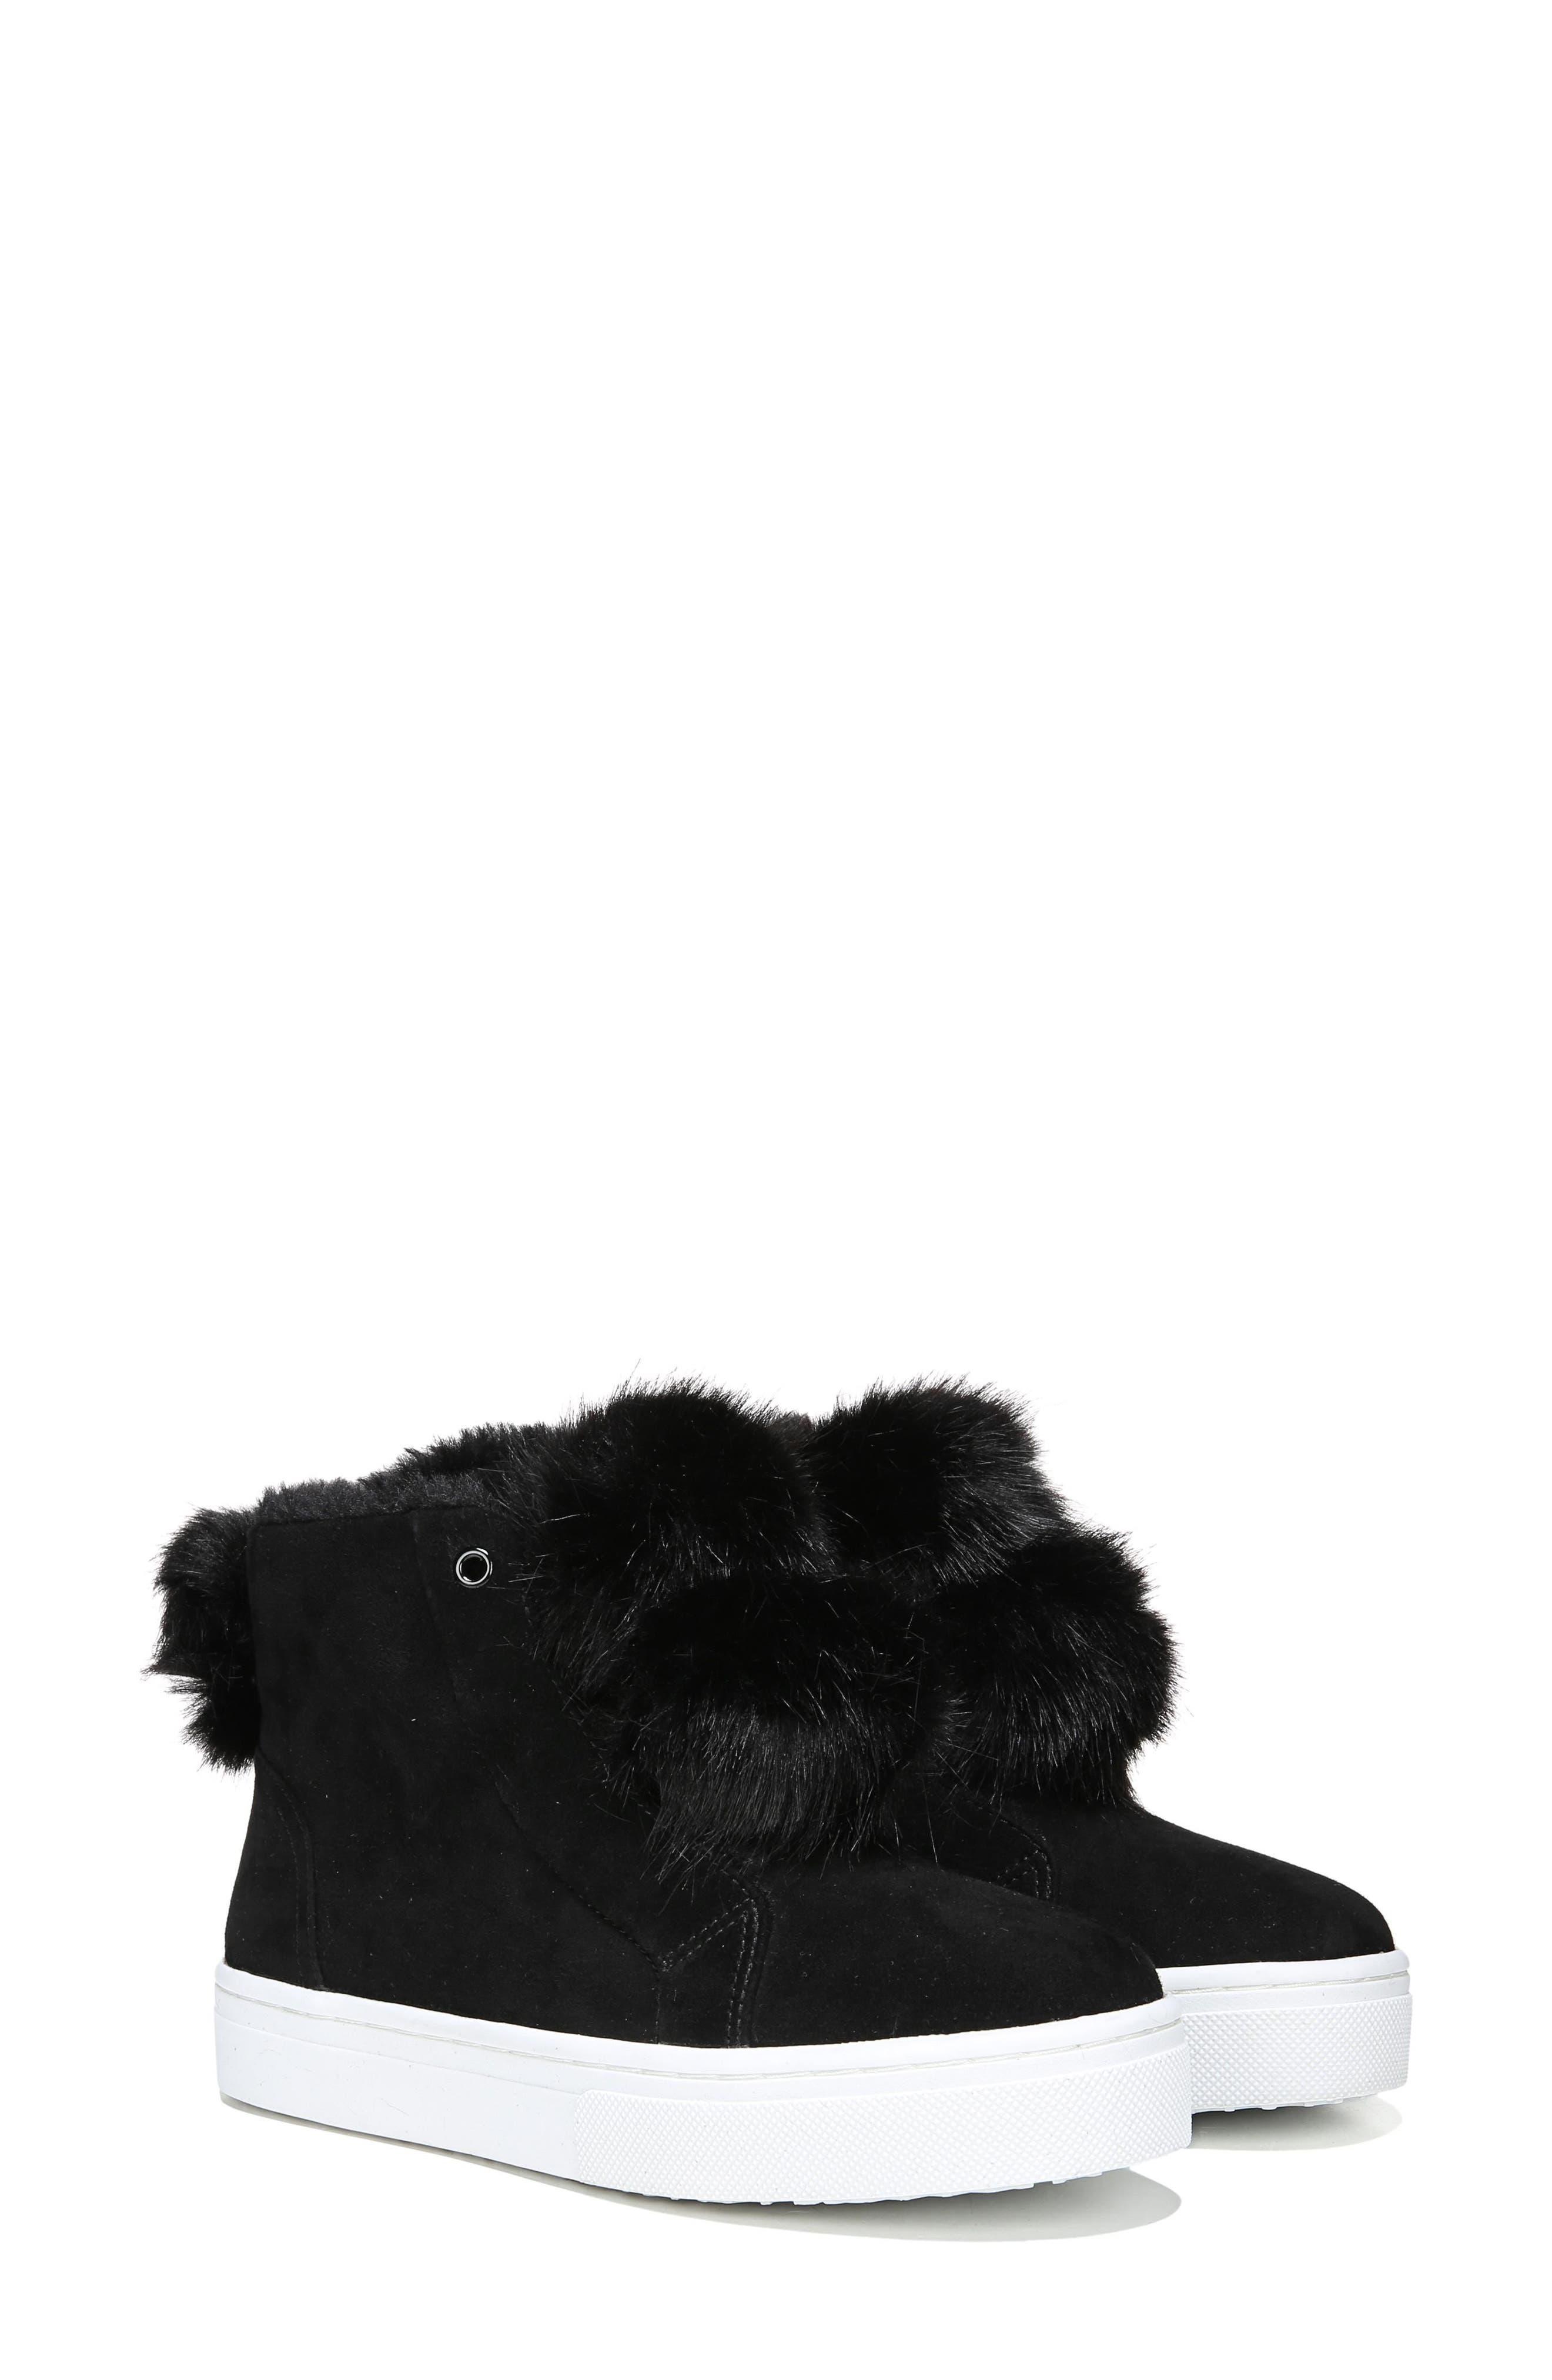 Lear Faux Fur Sneaker,                             Alternate thumbnail 8, color,                             001